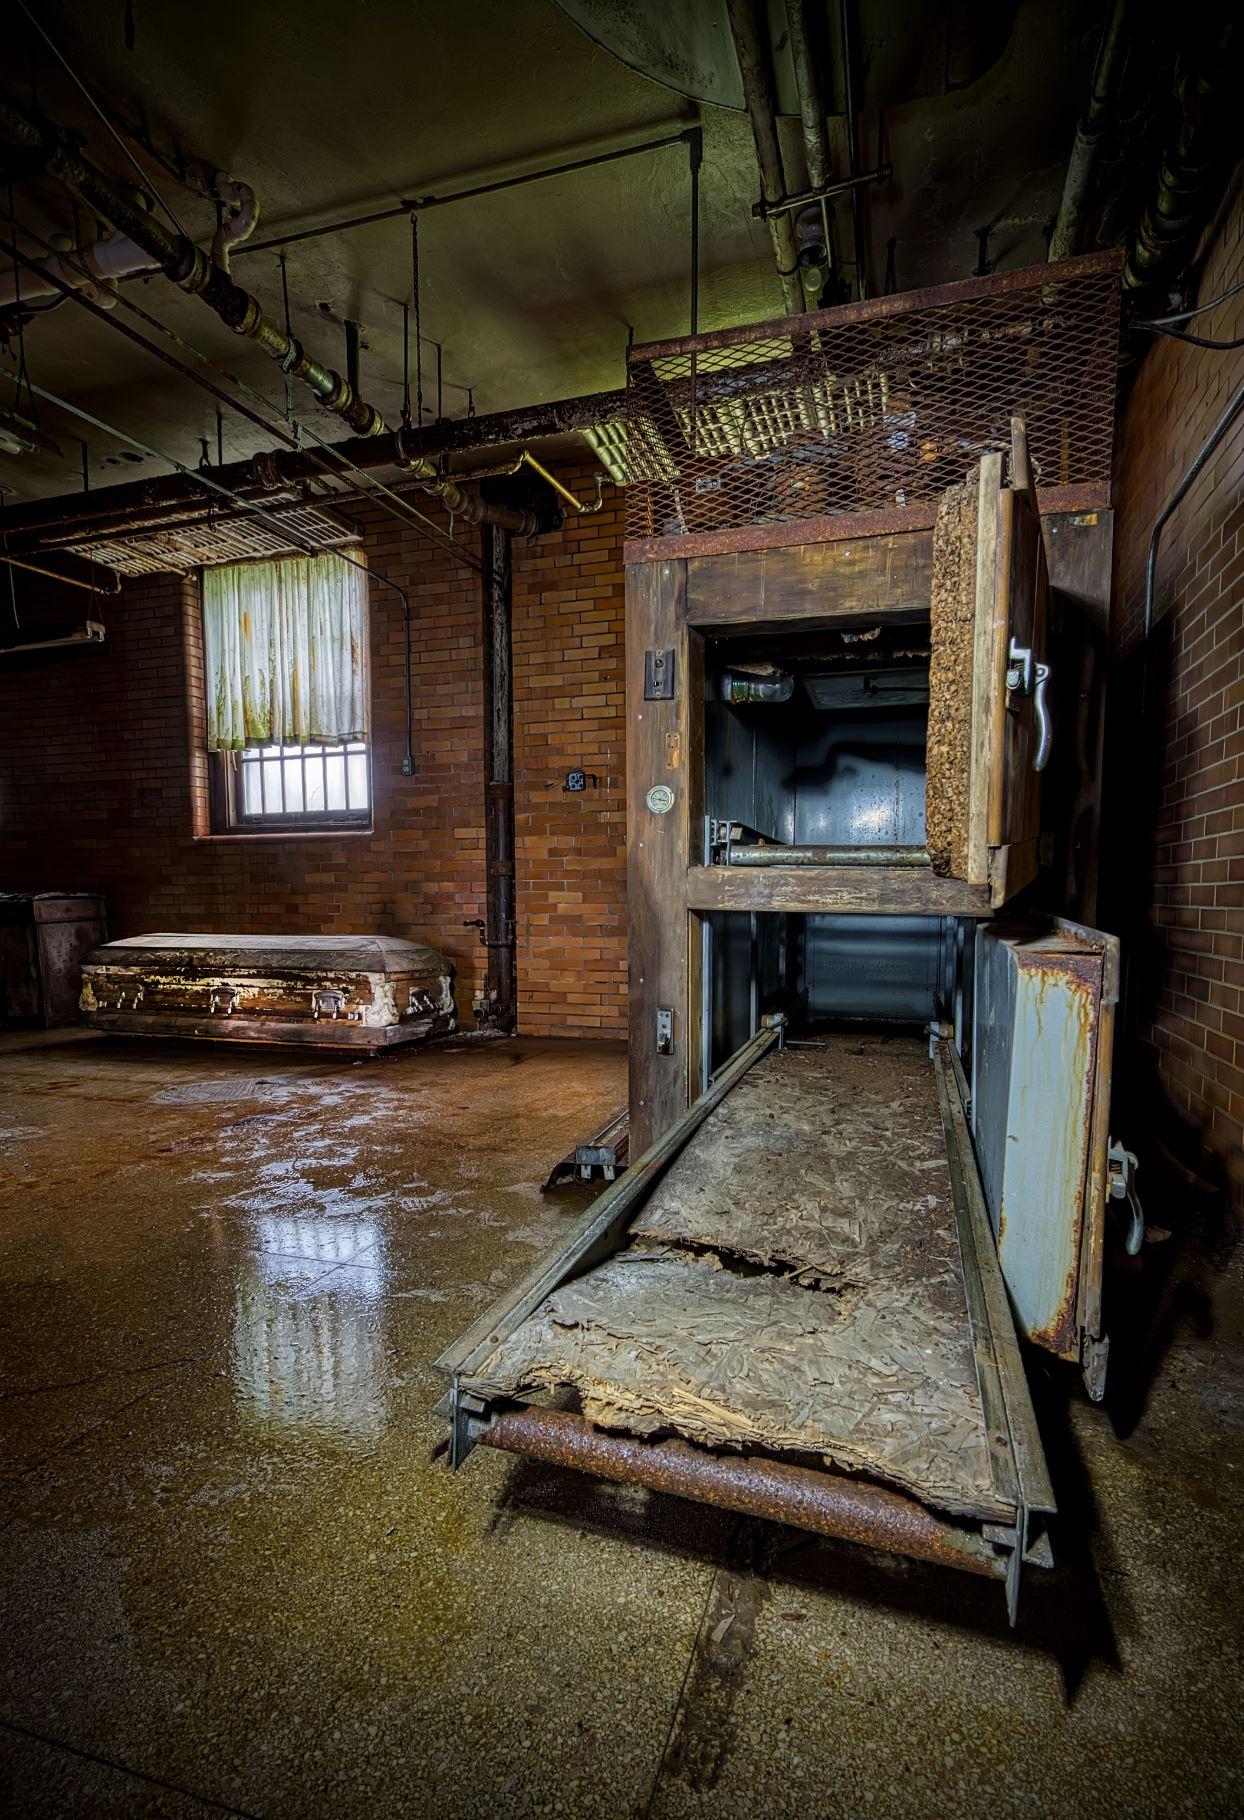 Morgue - Trans Allegheny Lunatic Asylum